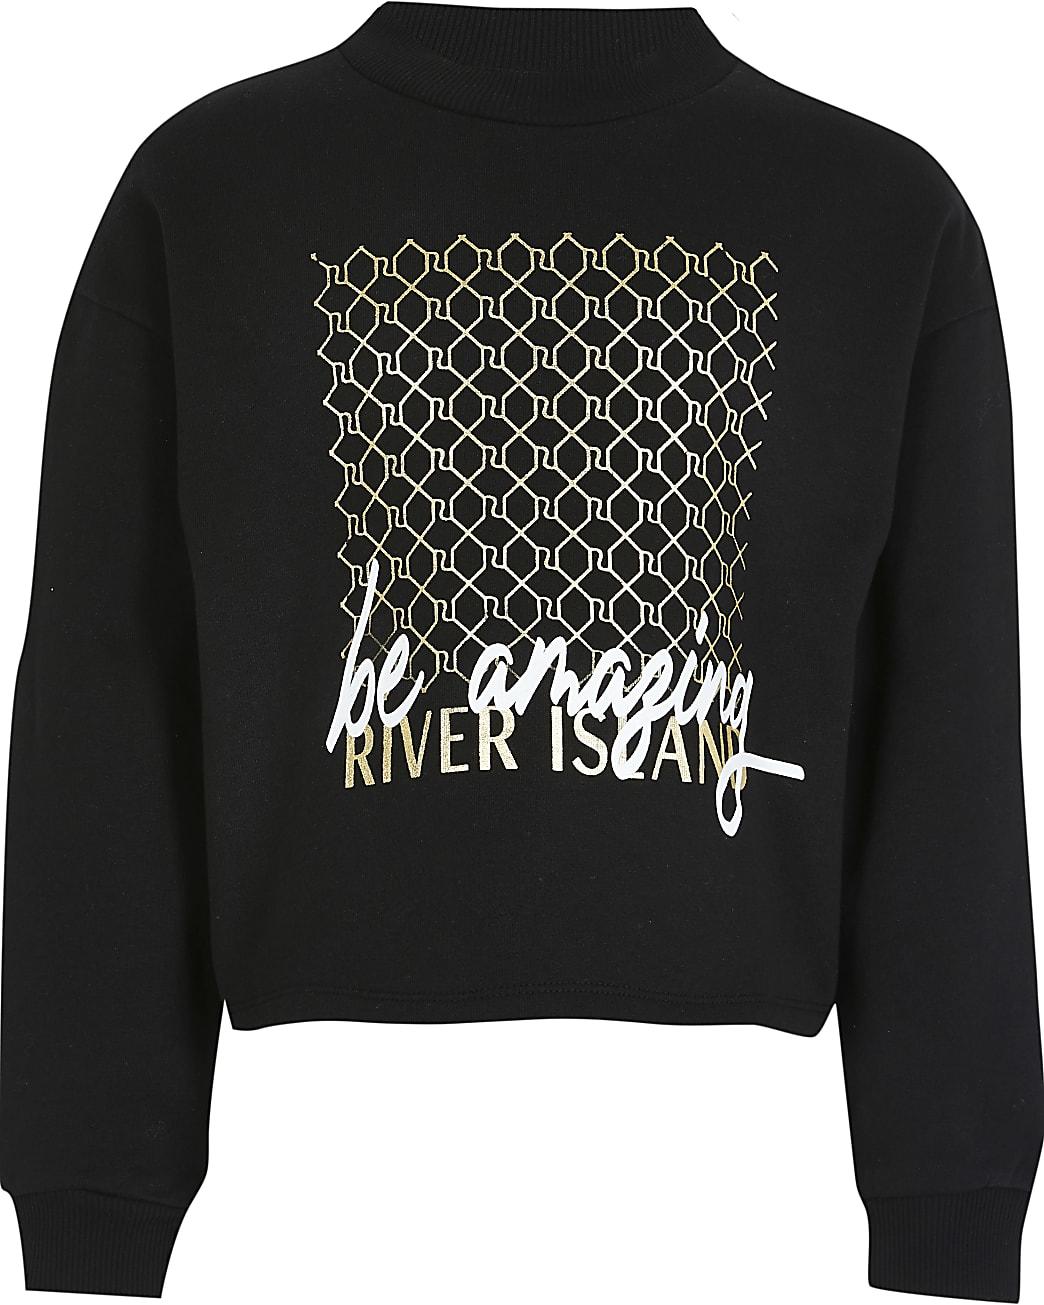 Age 13+ girls black 'Be amazing' sweatshirt